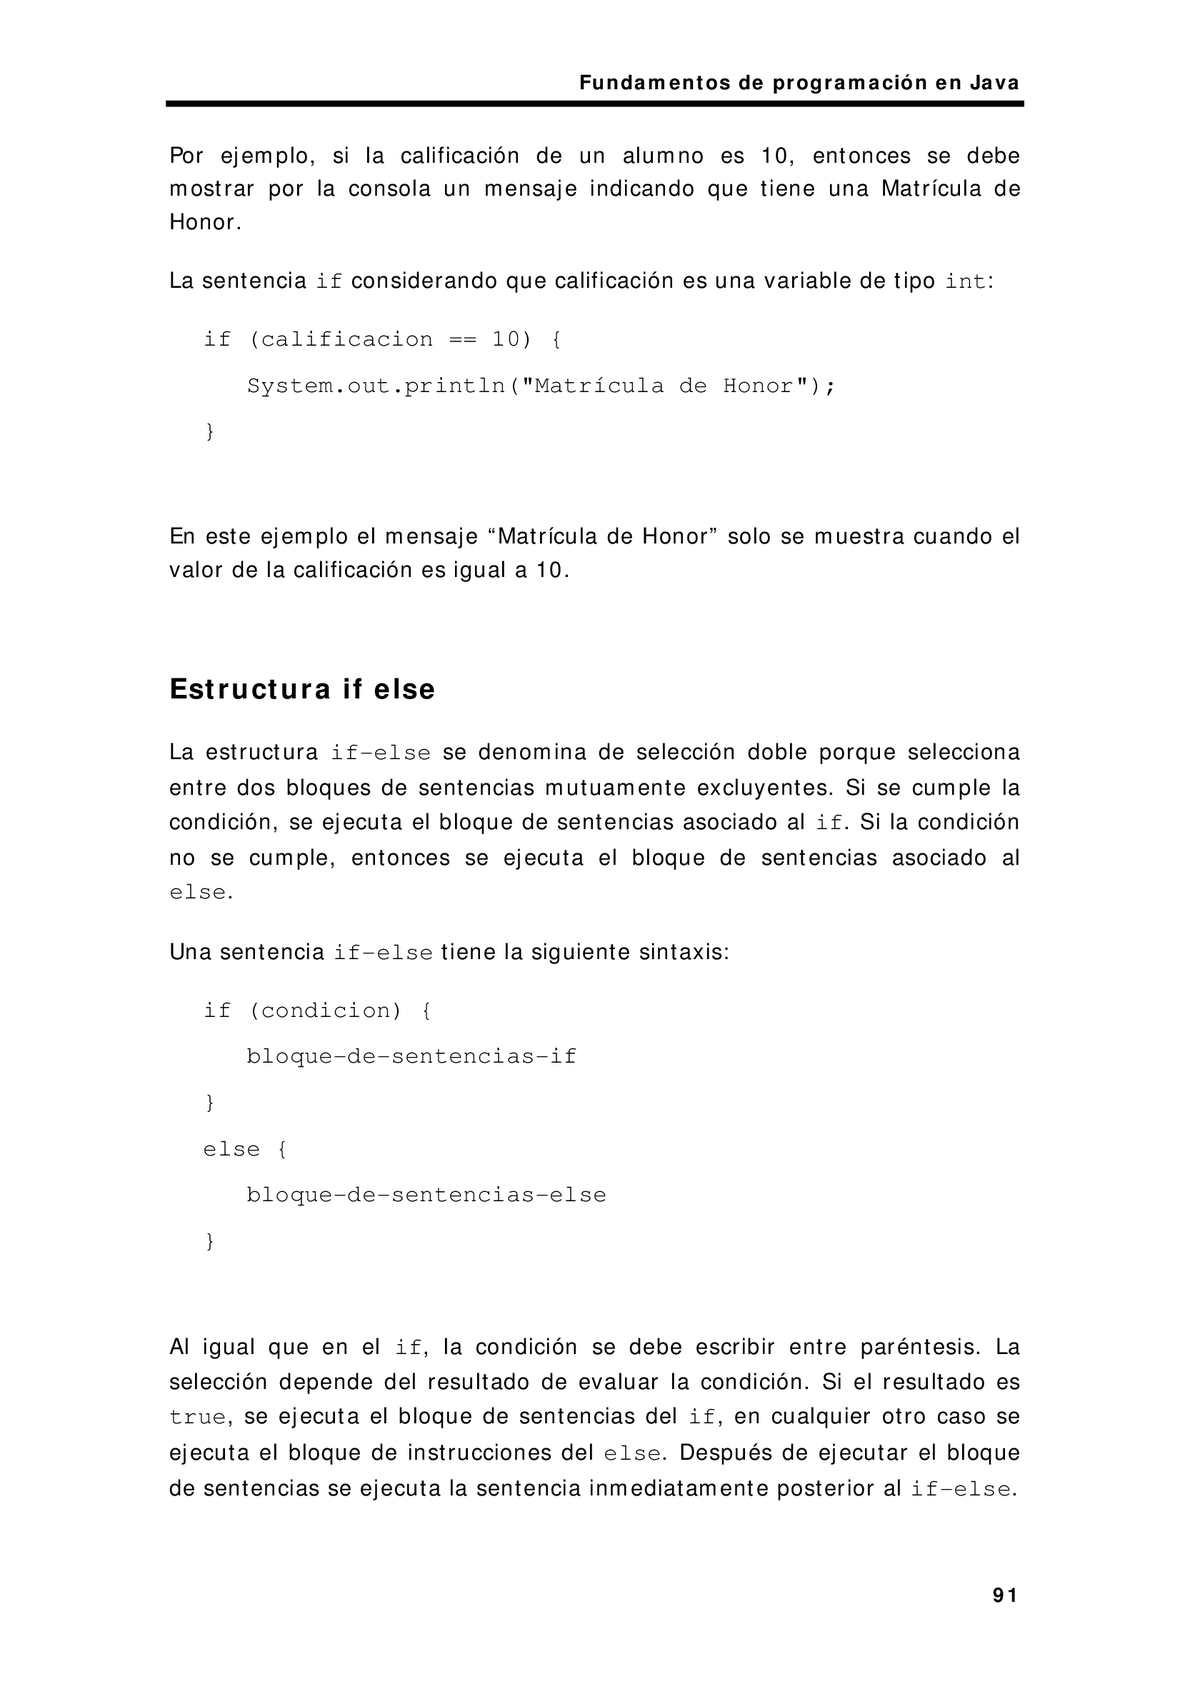 Java En Progrmacion Calameo Downloader